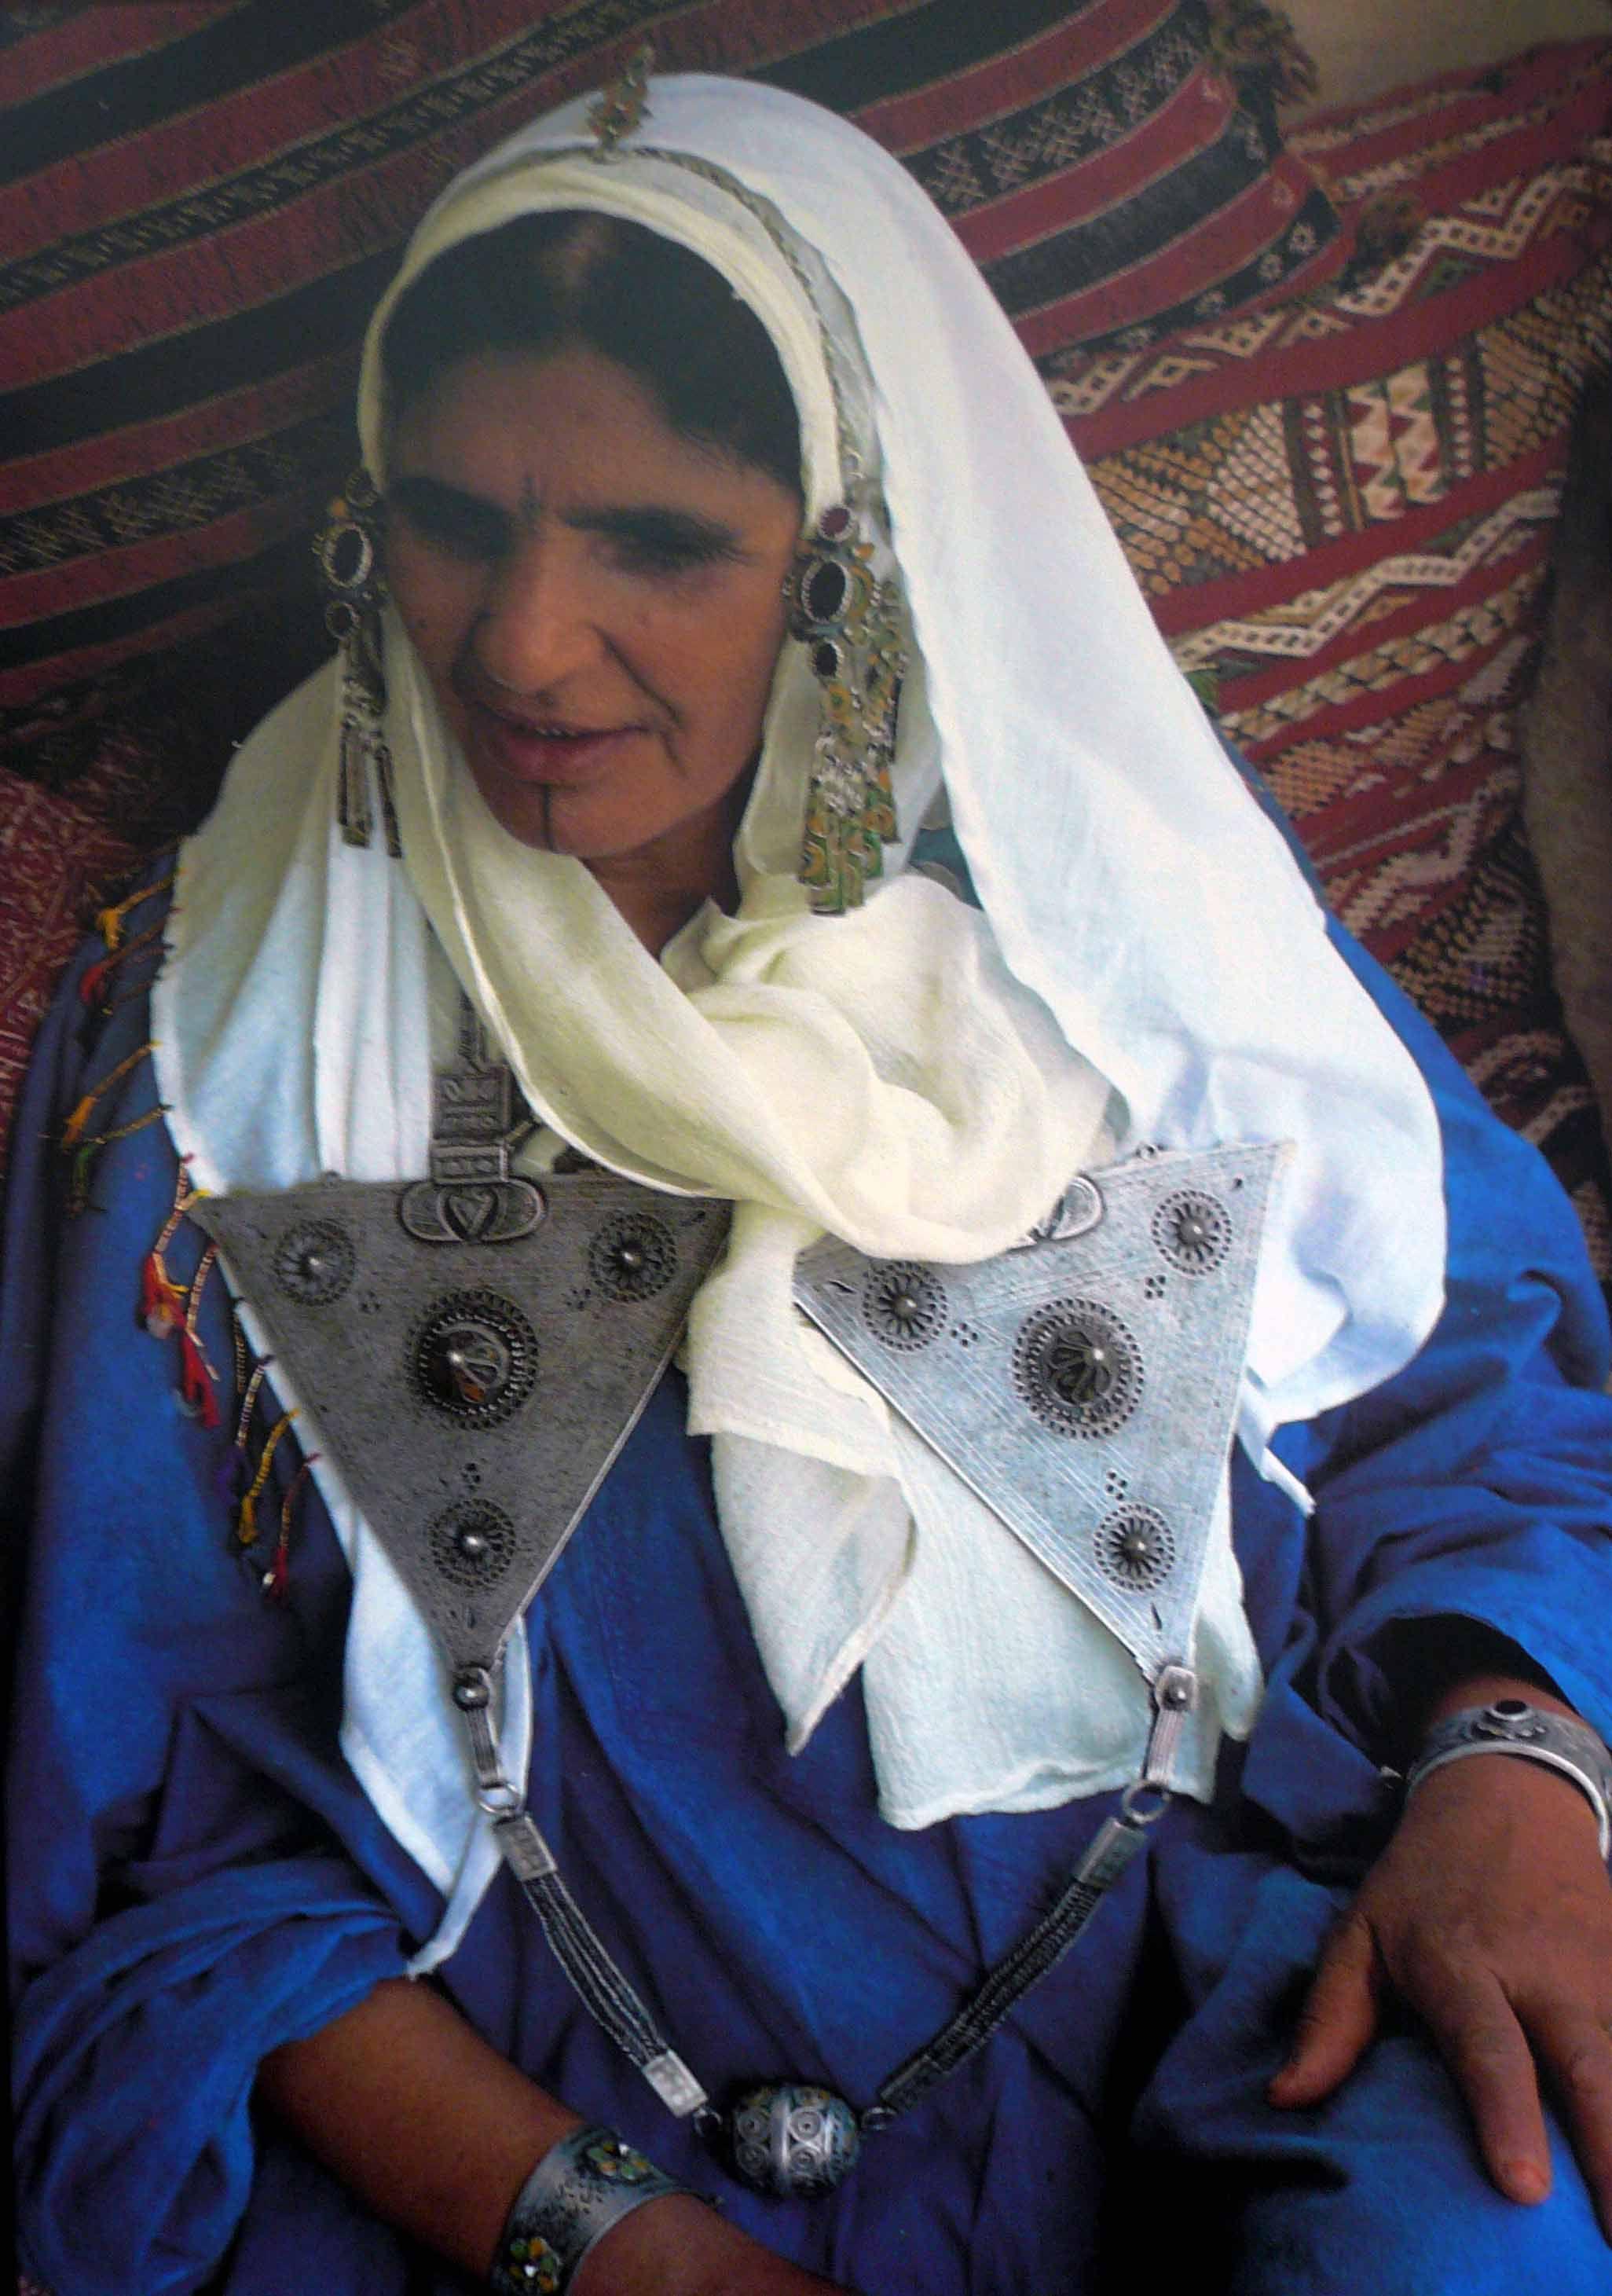 2018 – Dag 26 (9. juni) – Berbernes fibula-smykker sør i Marokko